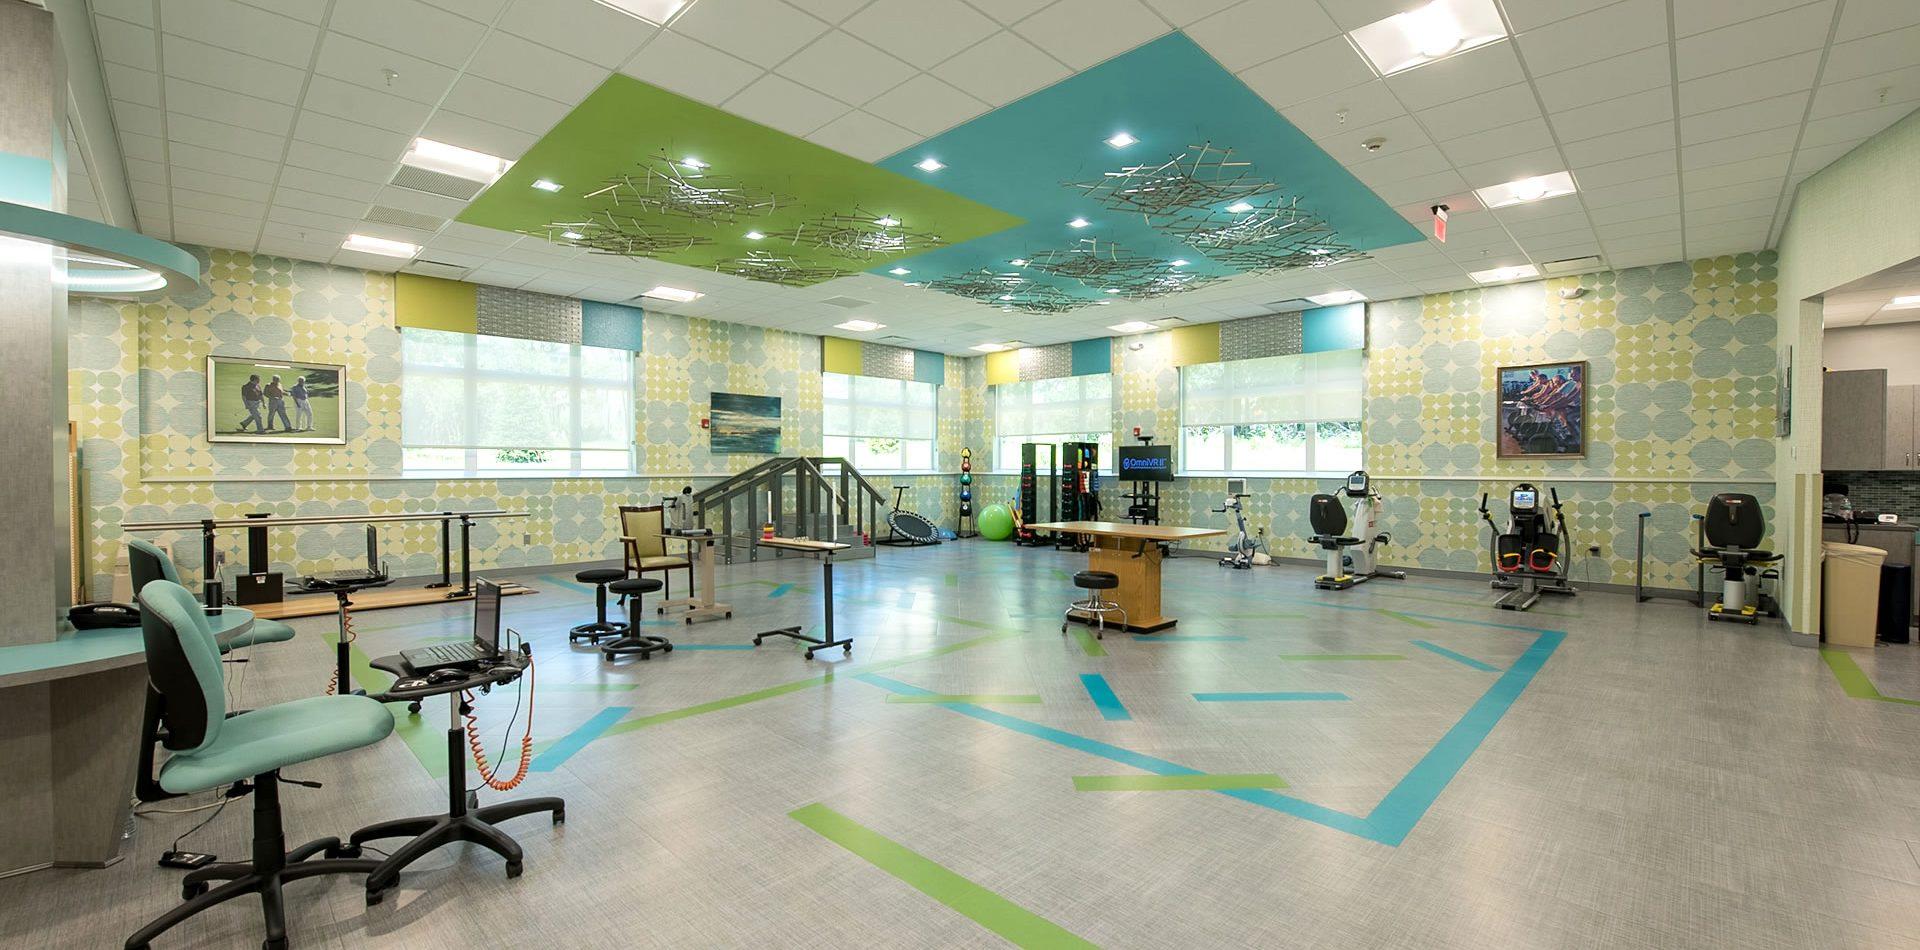 Stratford Manor Rehabilitation and Care Center